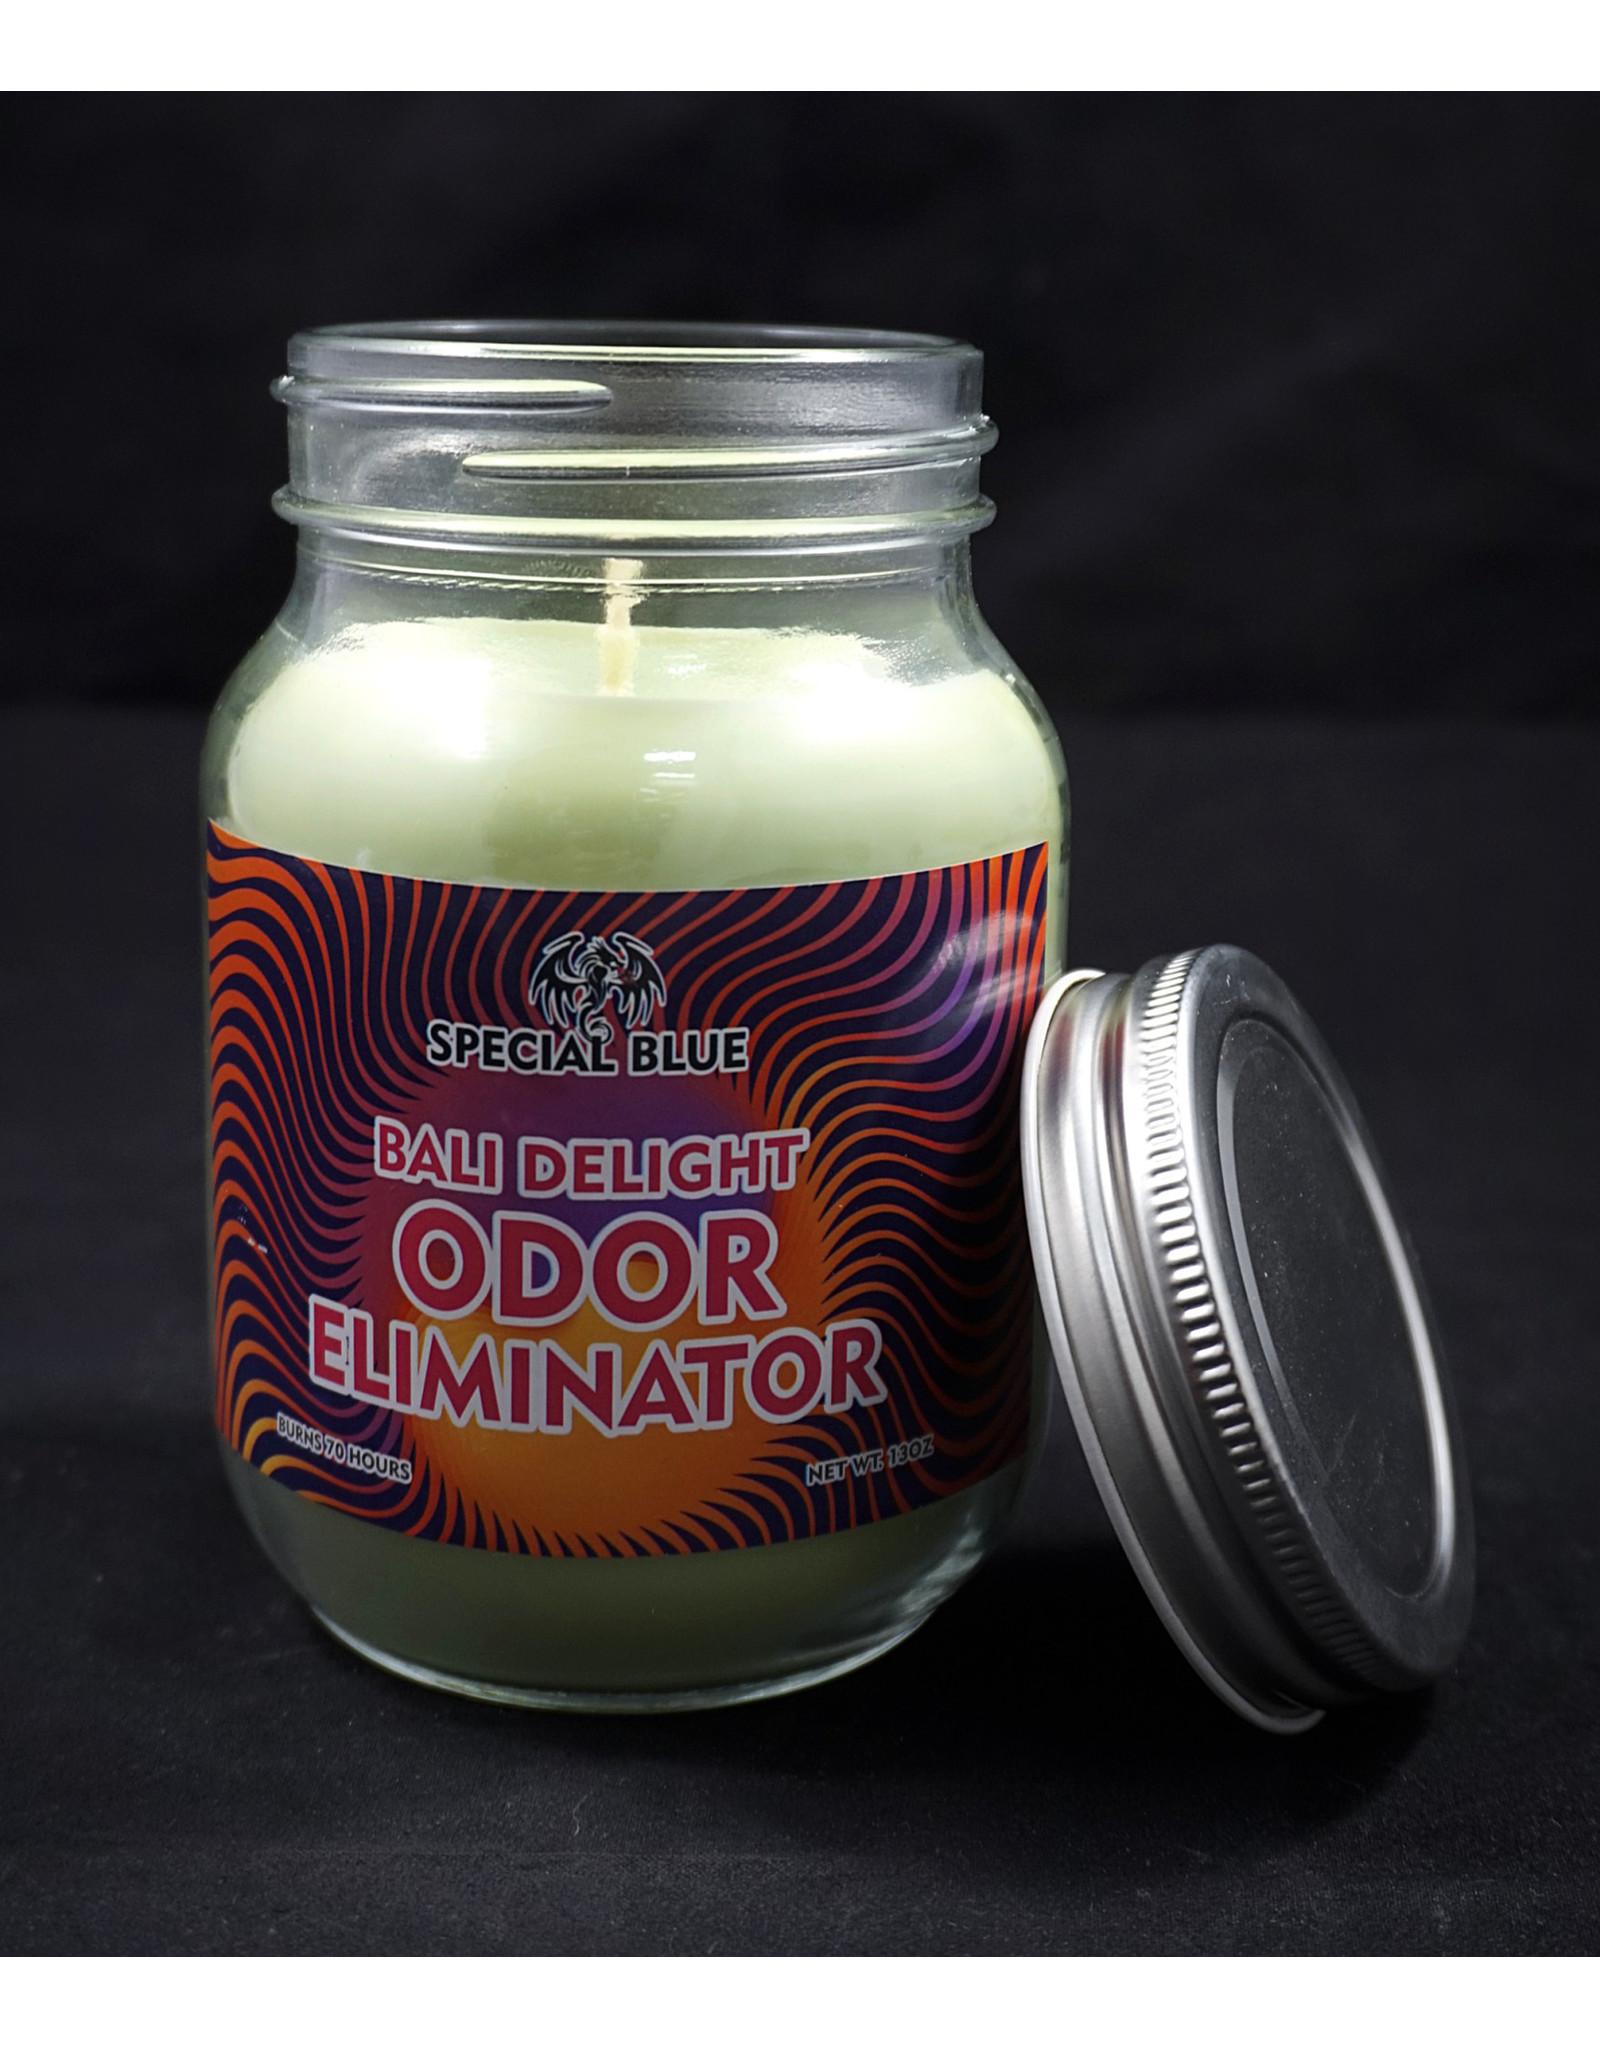 Special Blue Odor Eliminator Candle - Bali Delight